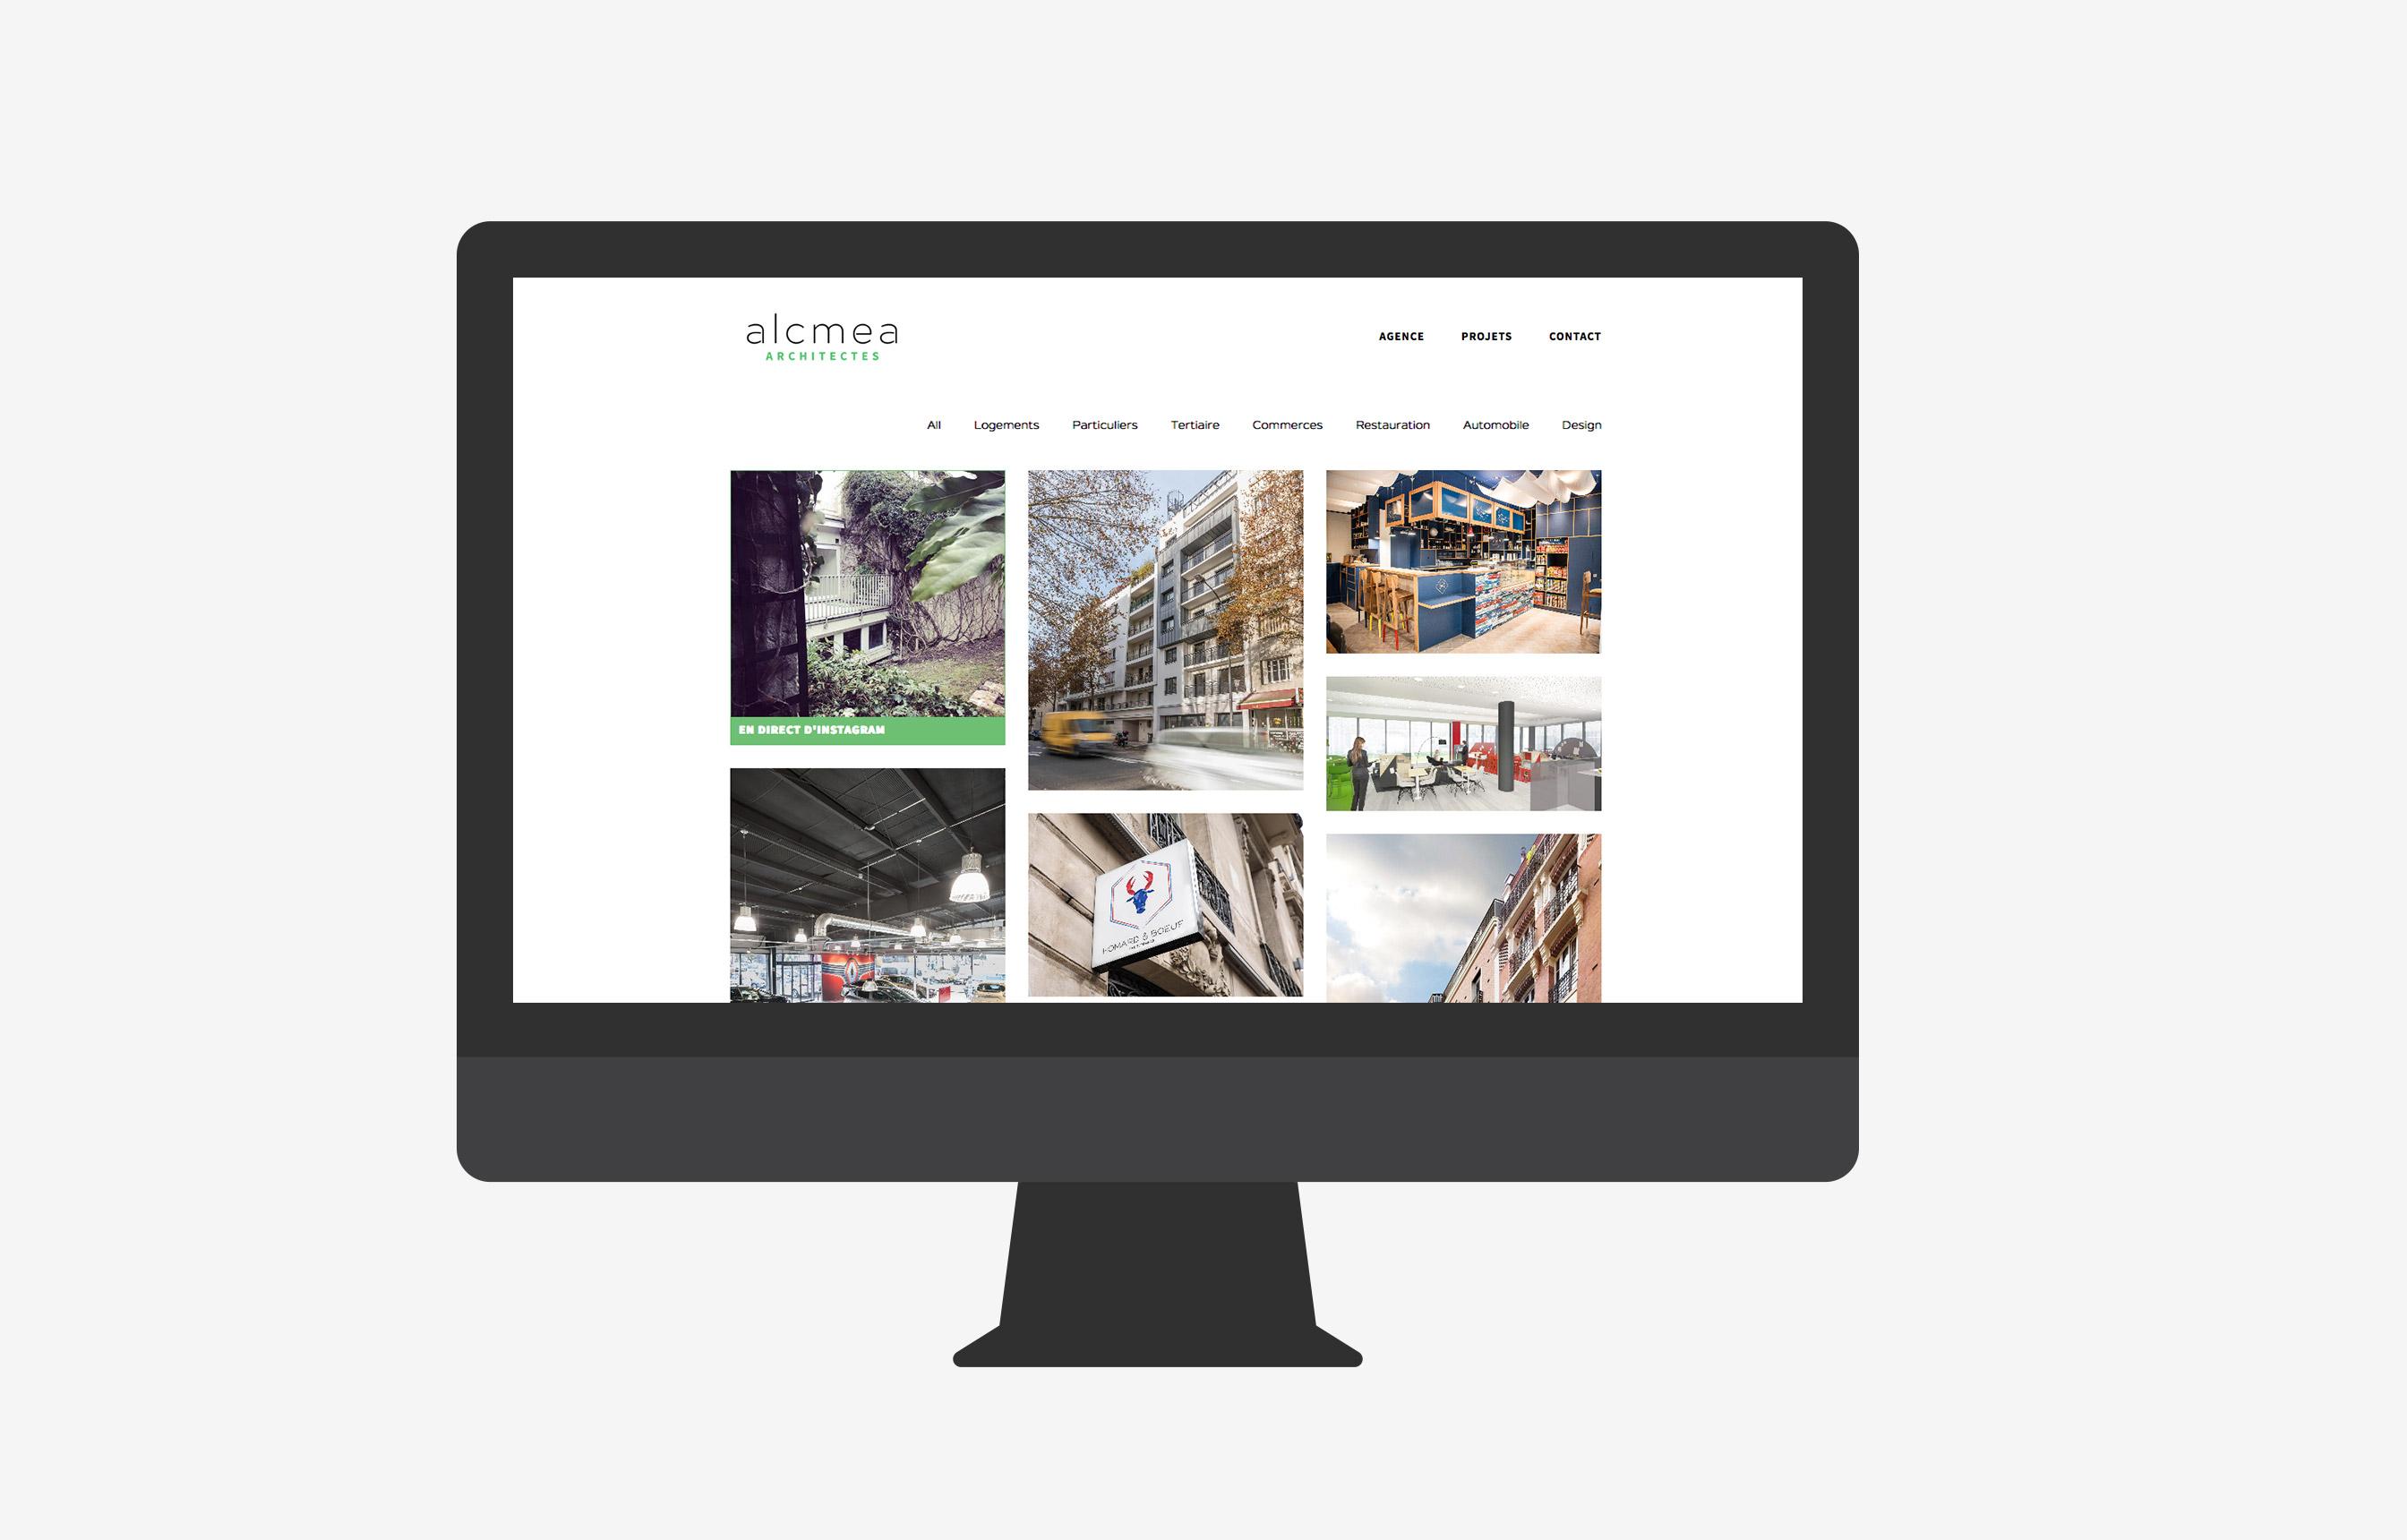 01-alcmea-pikteo-webdesign-graphic-design-freelance-paris-bruxelles-londres